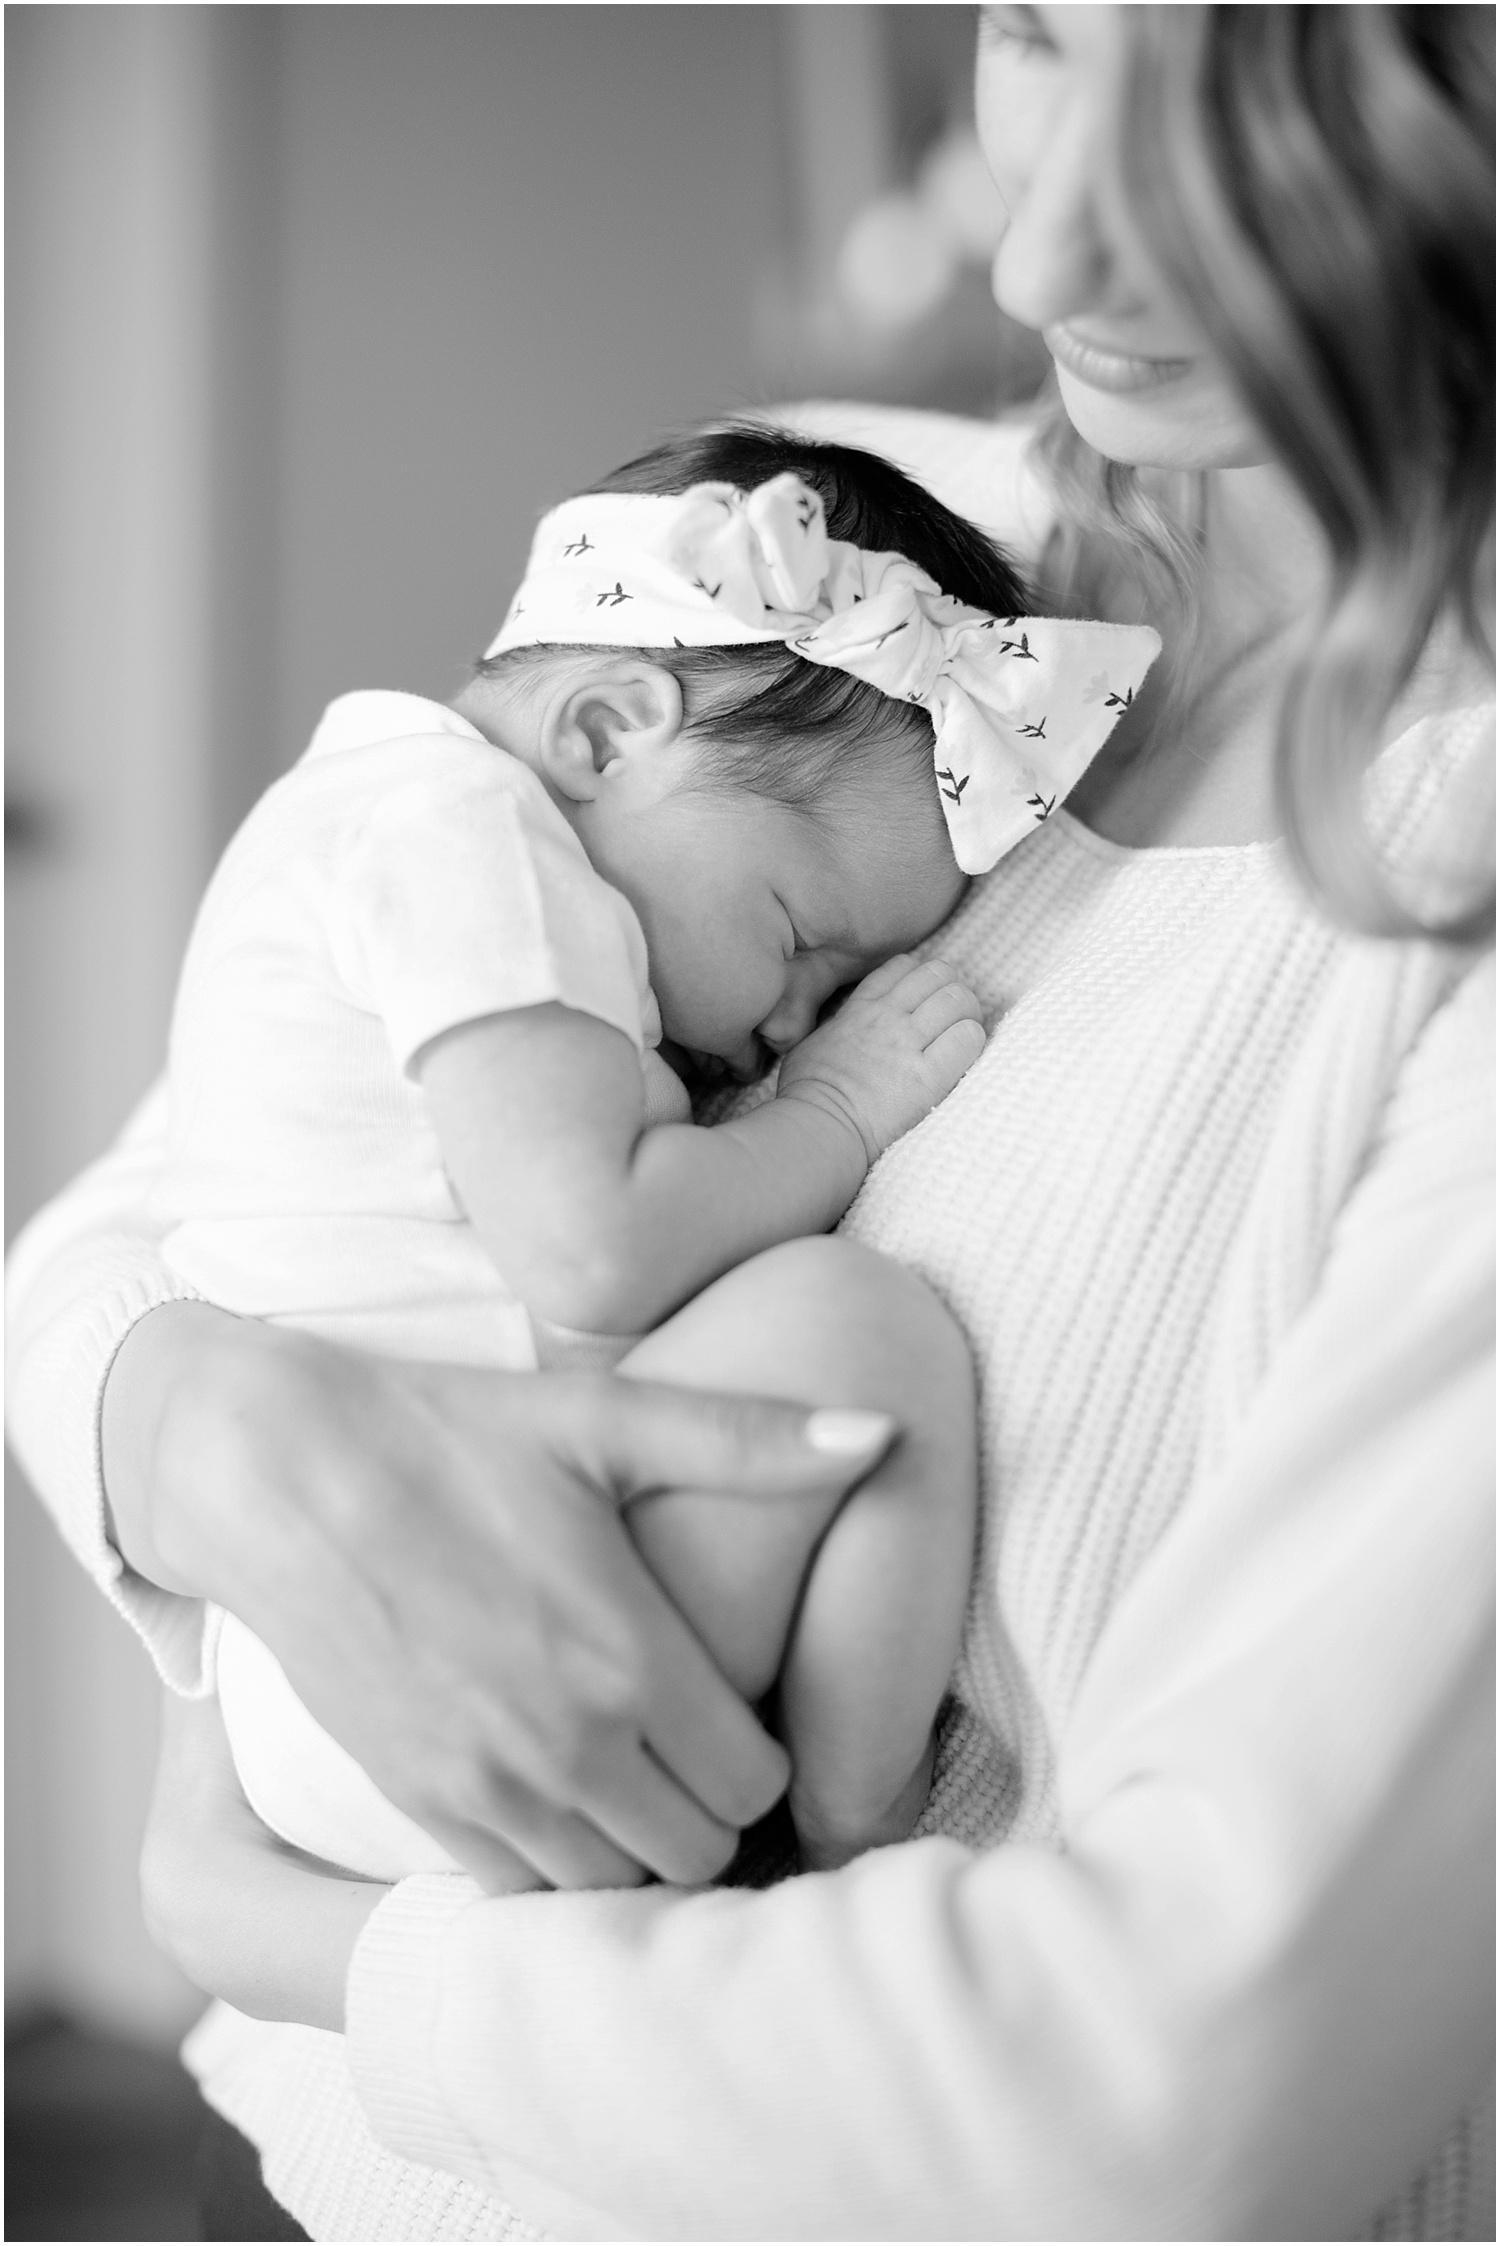 Ashley Powell Photography   Nora Newborn Session_0038.jpg